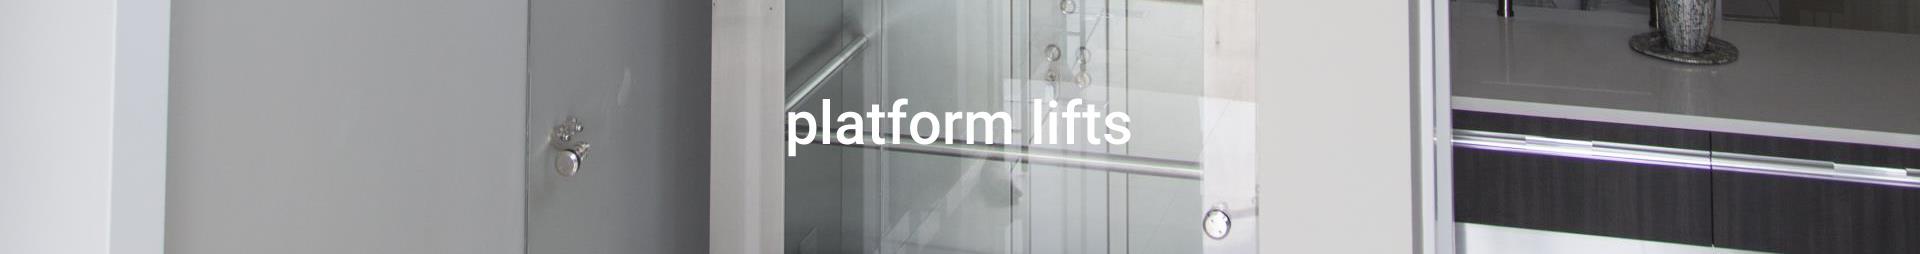 platformlift